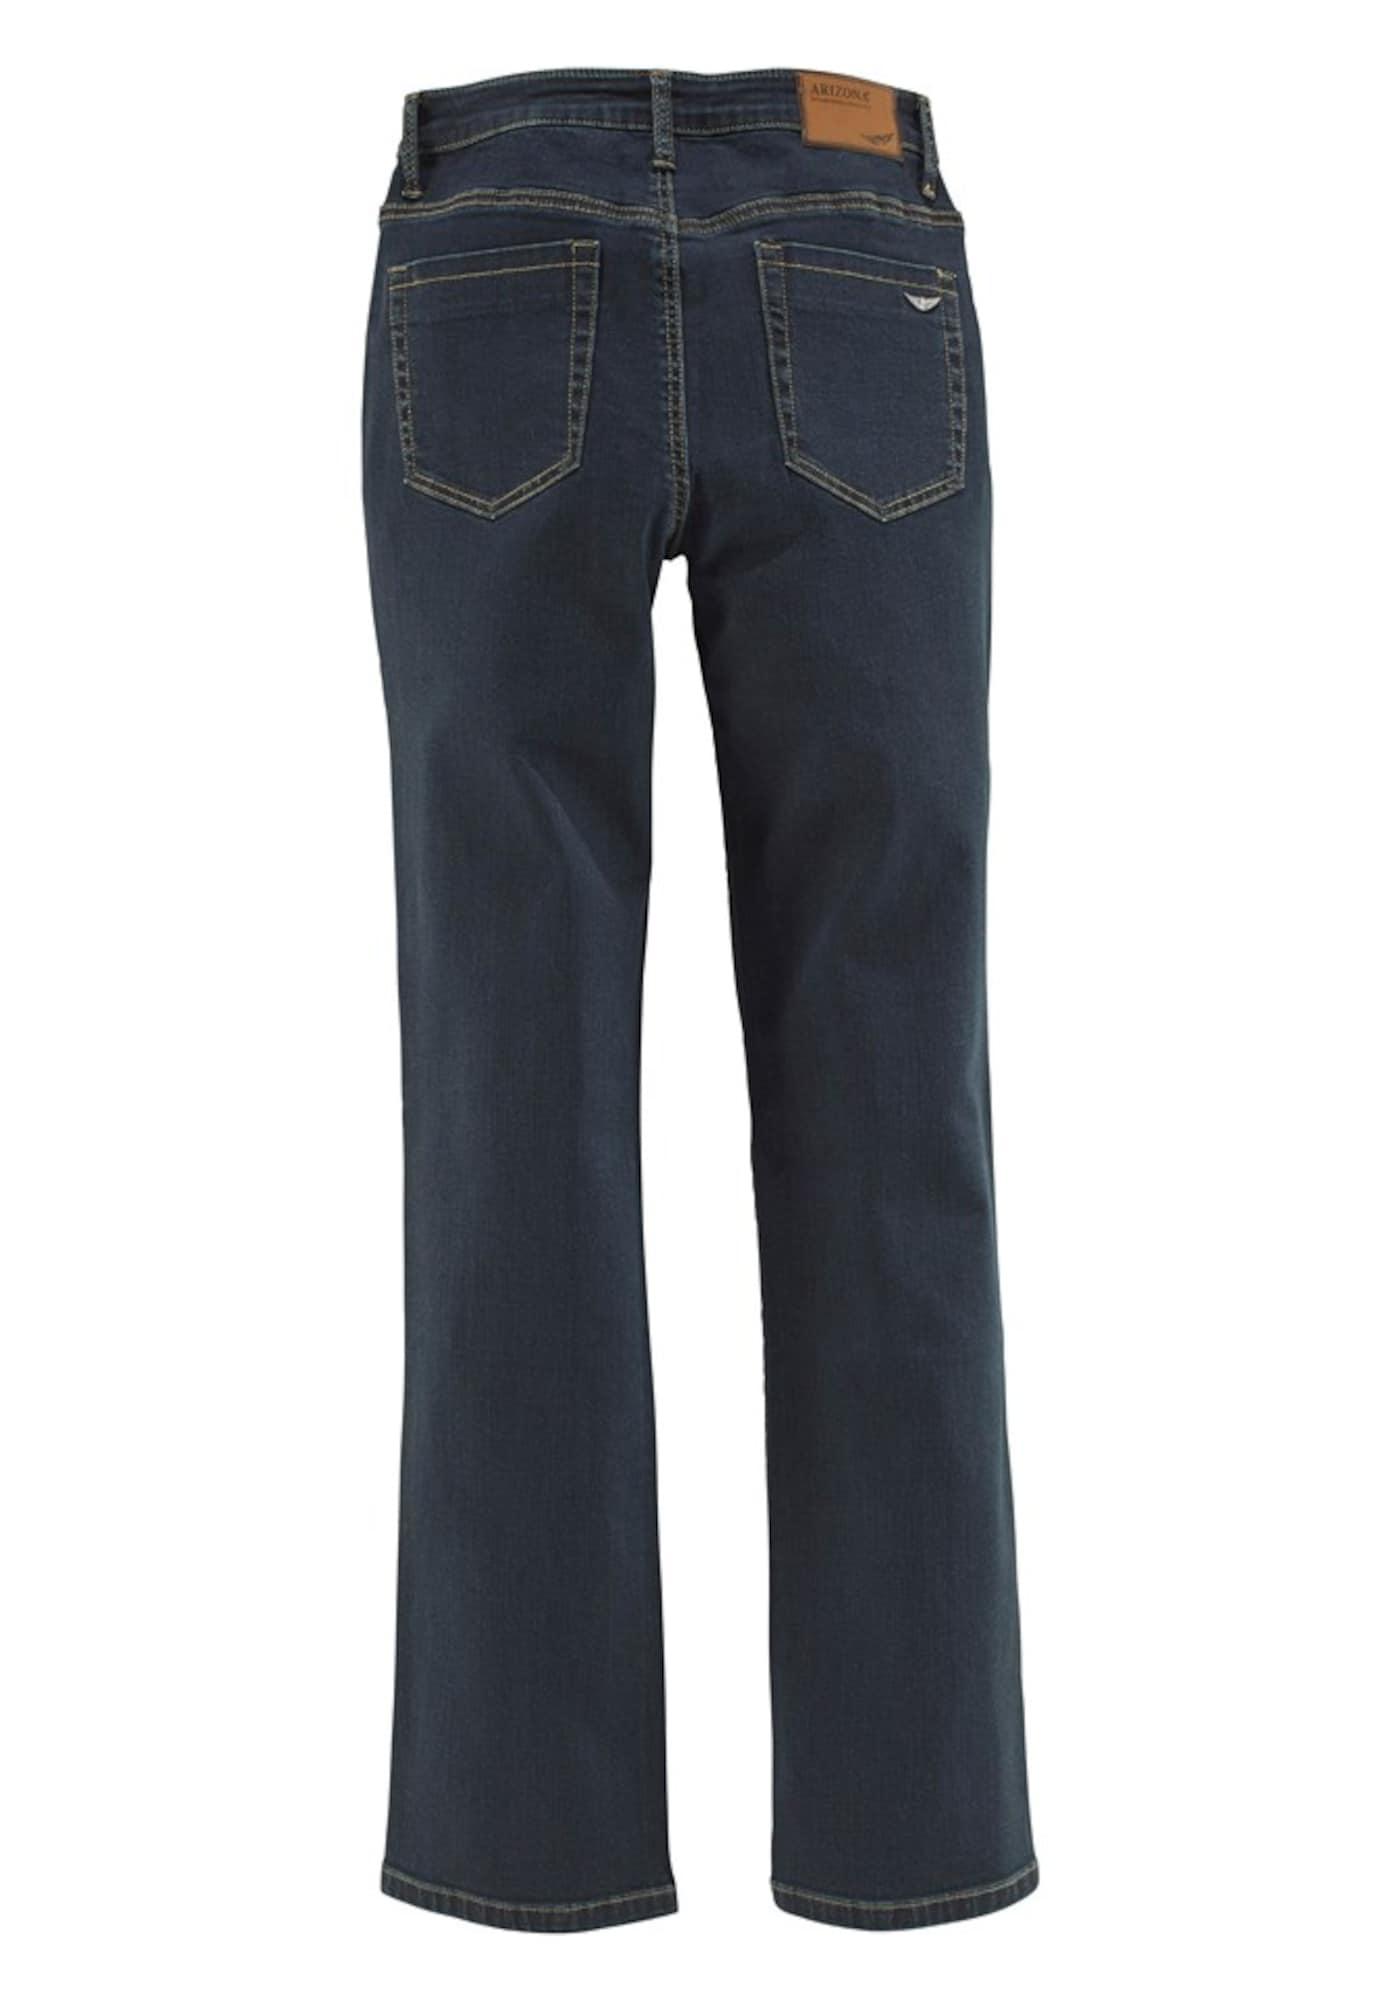 9acf01cddc ARIZONA Jeansy 'Gerade-Form mit komfortabler Leibhöhe  czarny denim